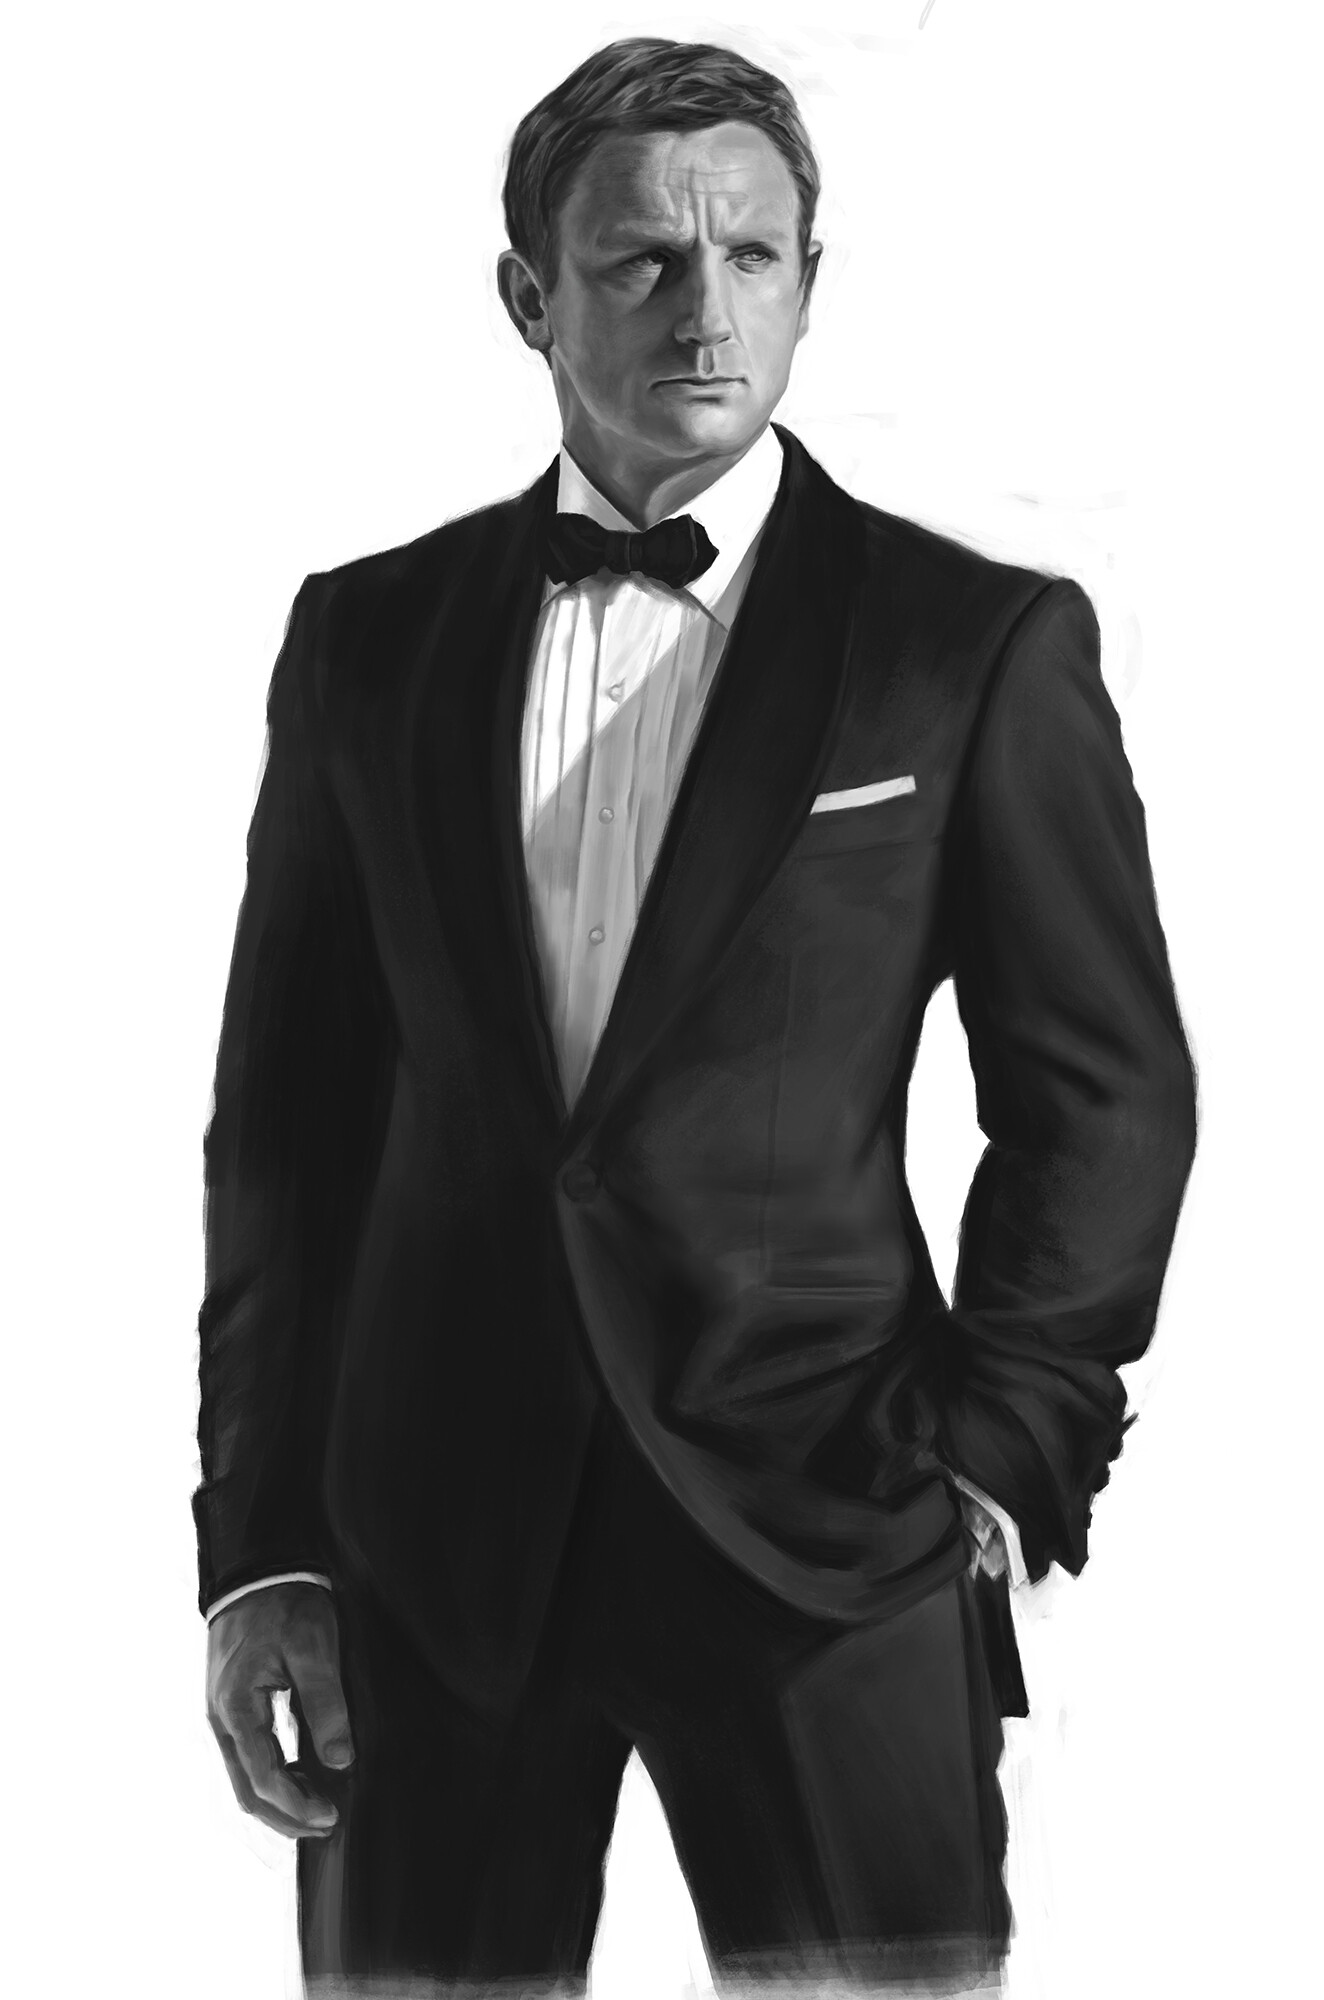 007_Daniel Craig